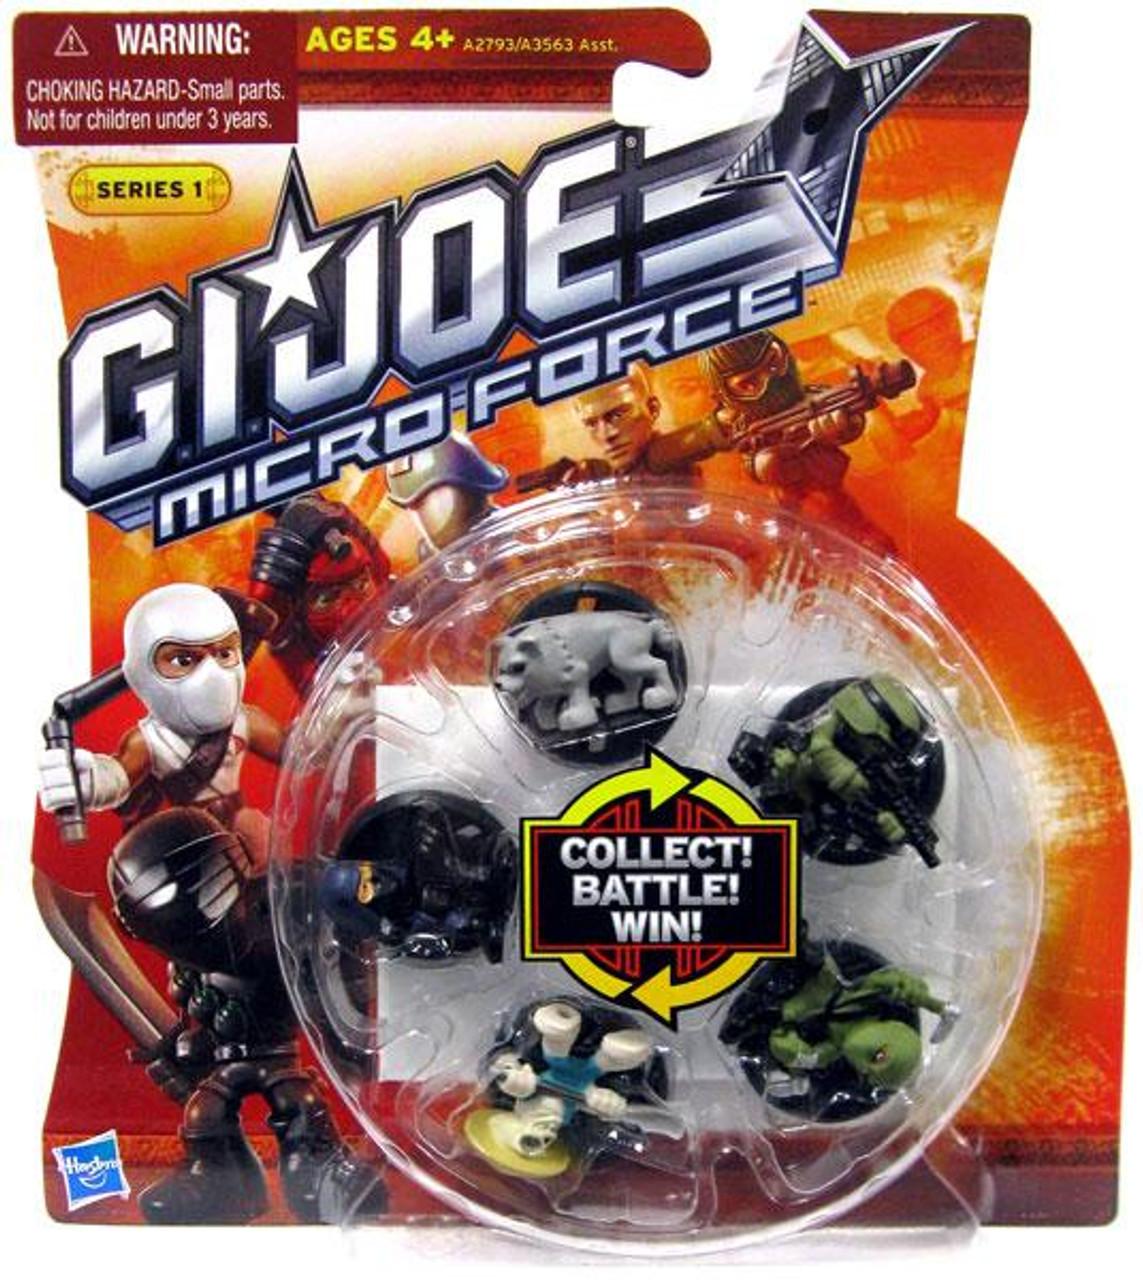 GI Joe Micro Force Series 1 Starter Set